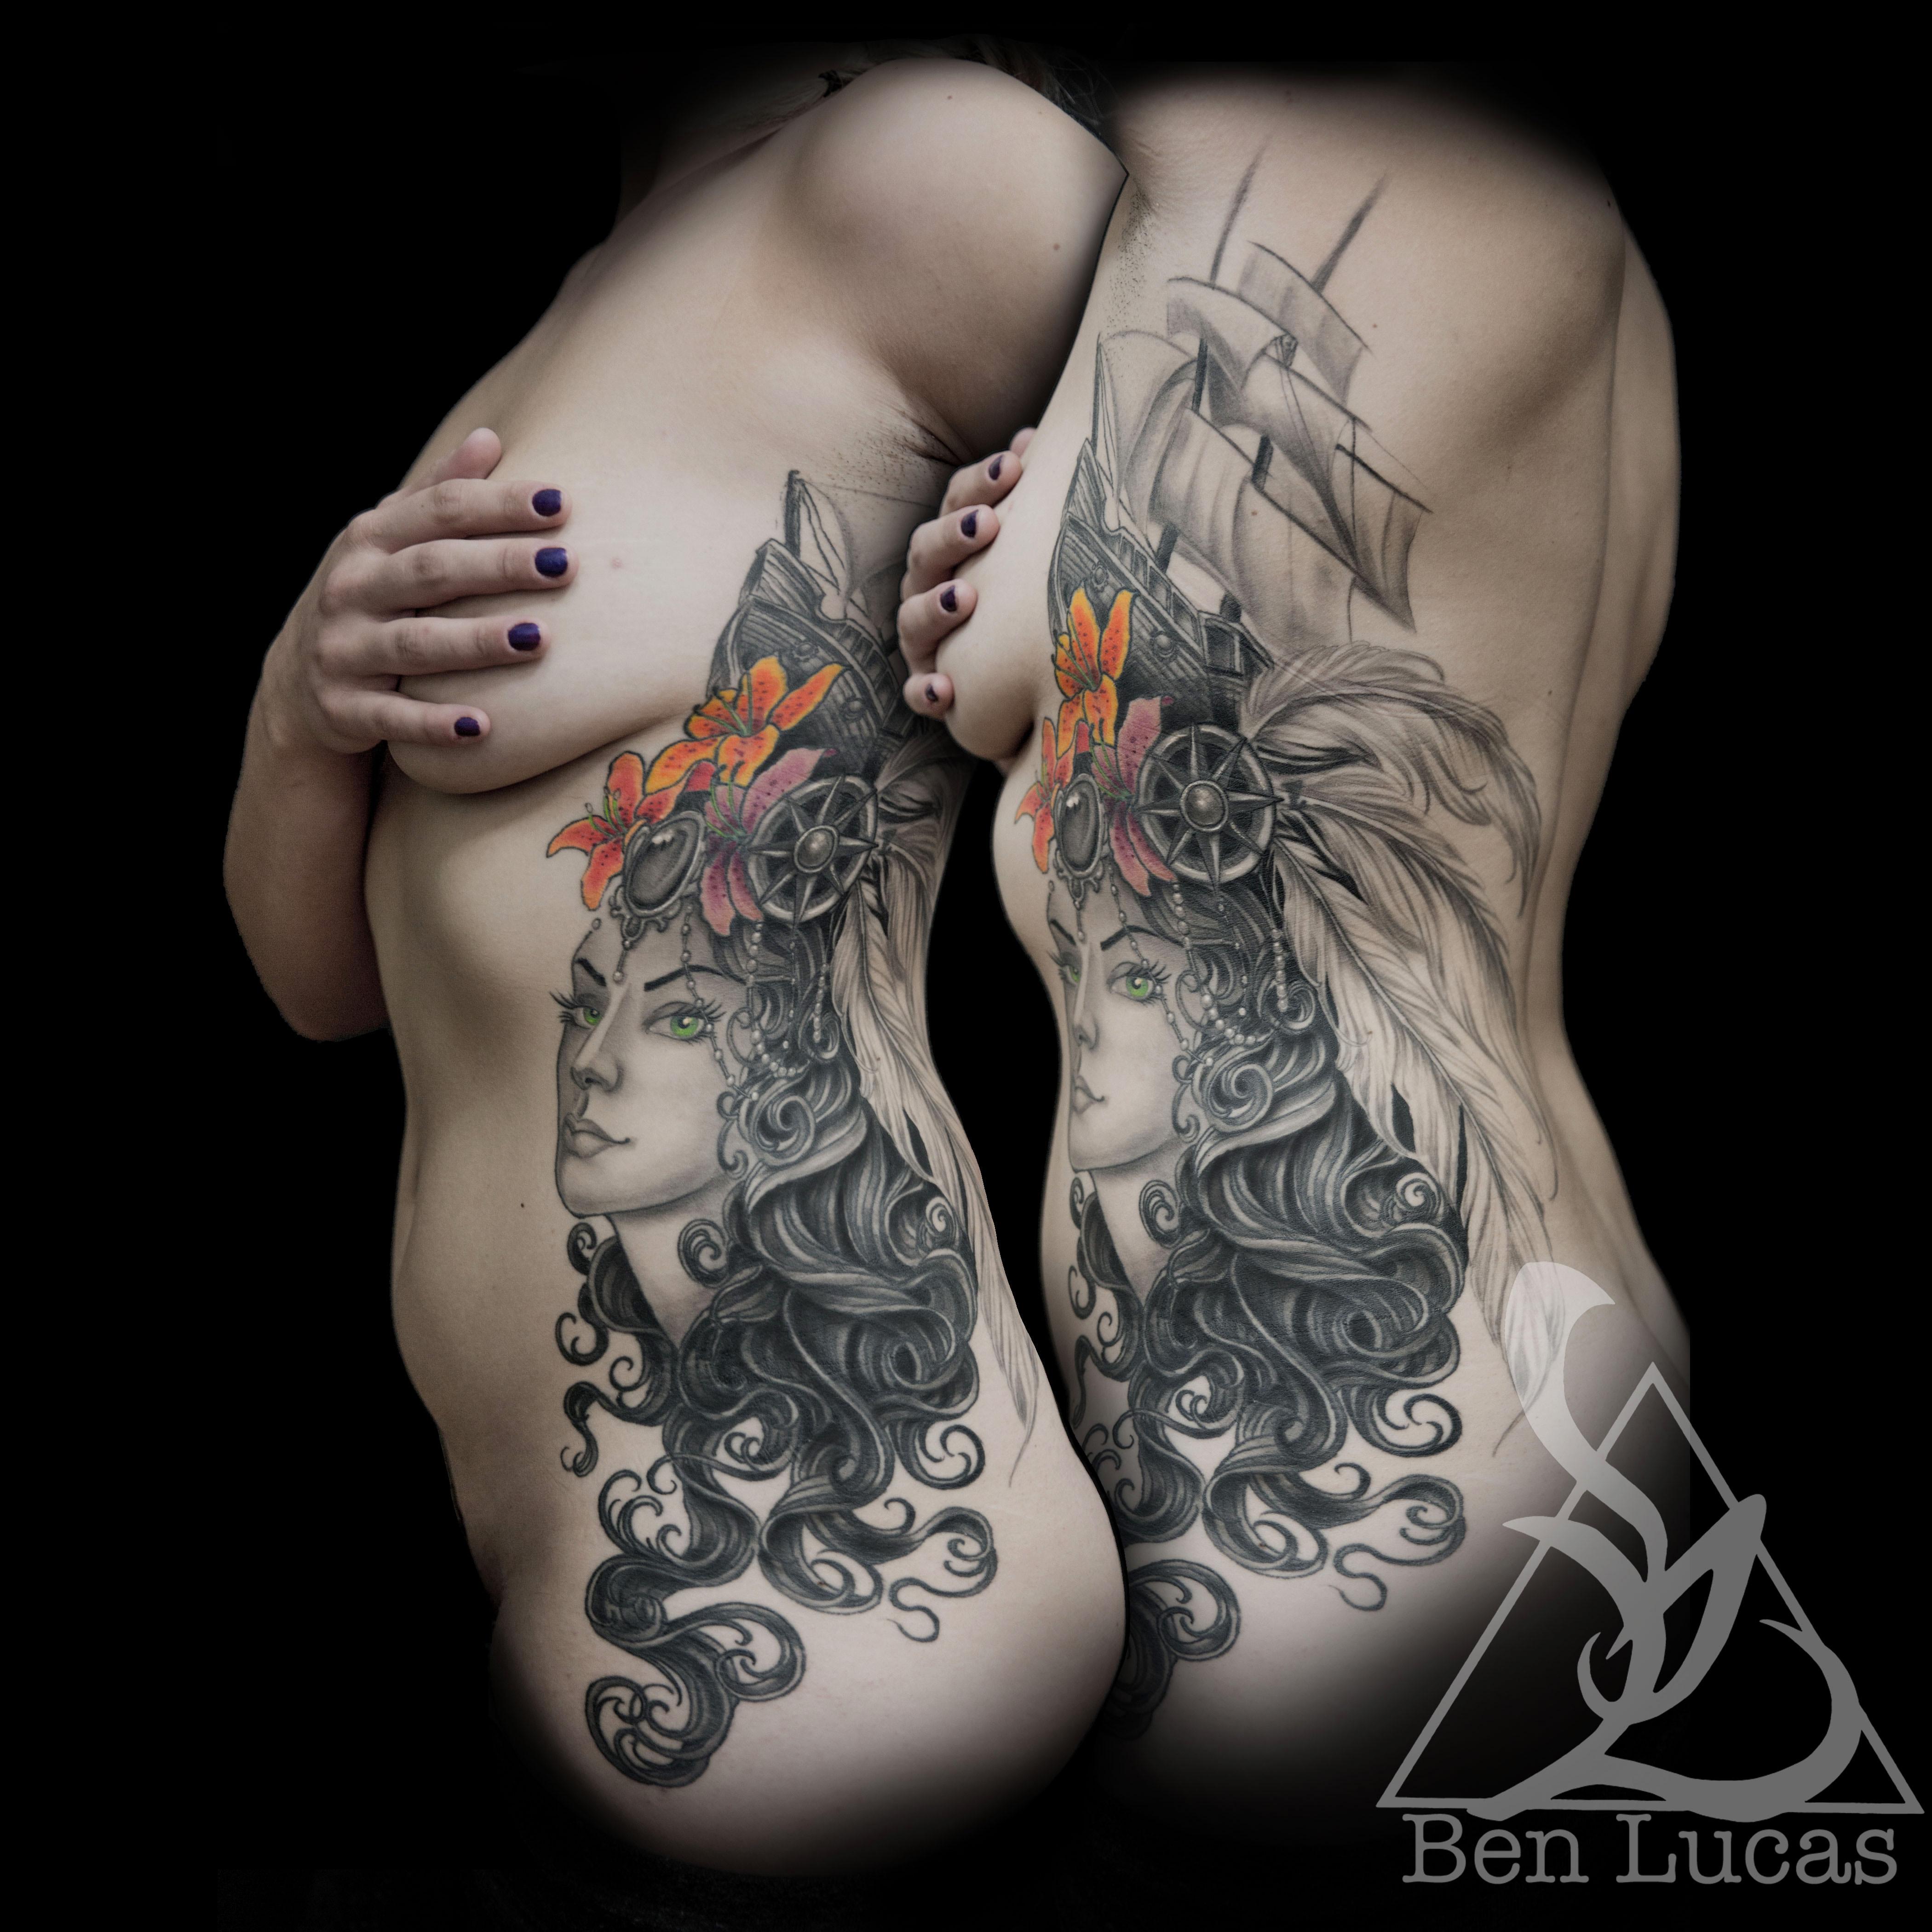 b6db85d86 ... Ashleys-Marie-Antoinette-stargazer-tiger-lily-side-tattoo- ...